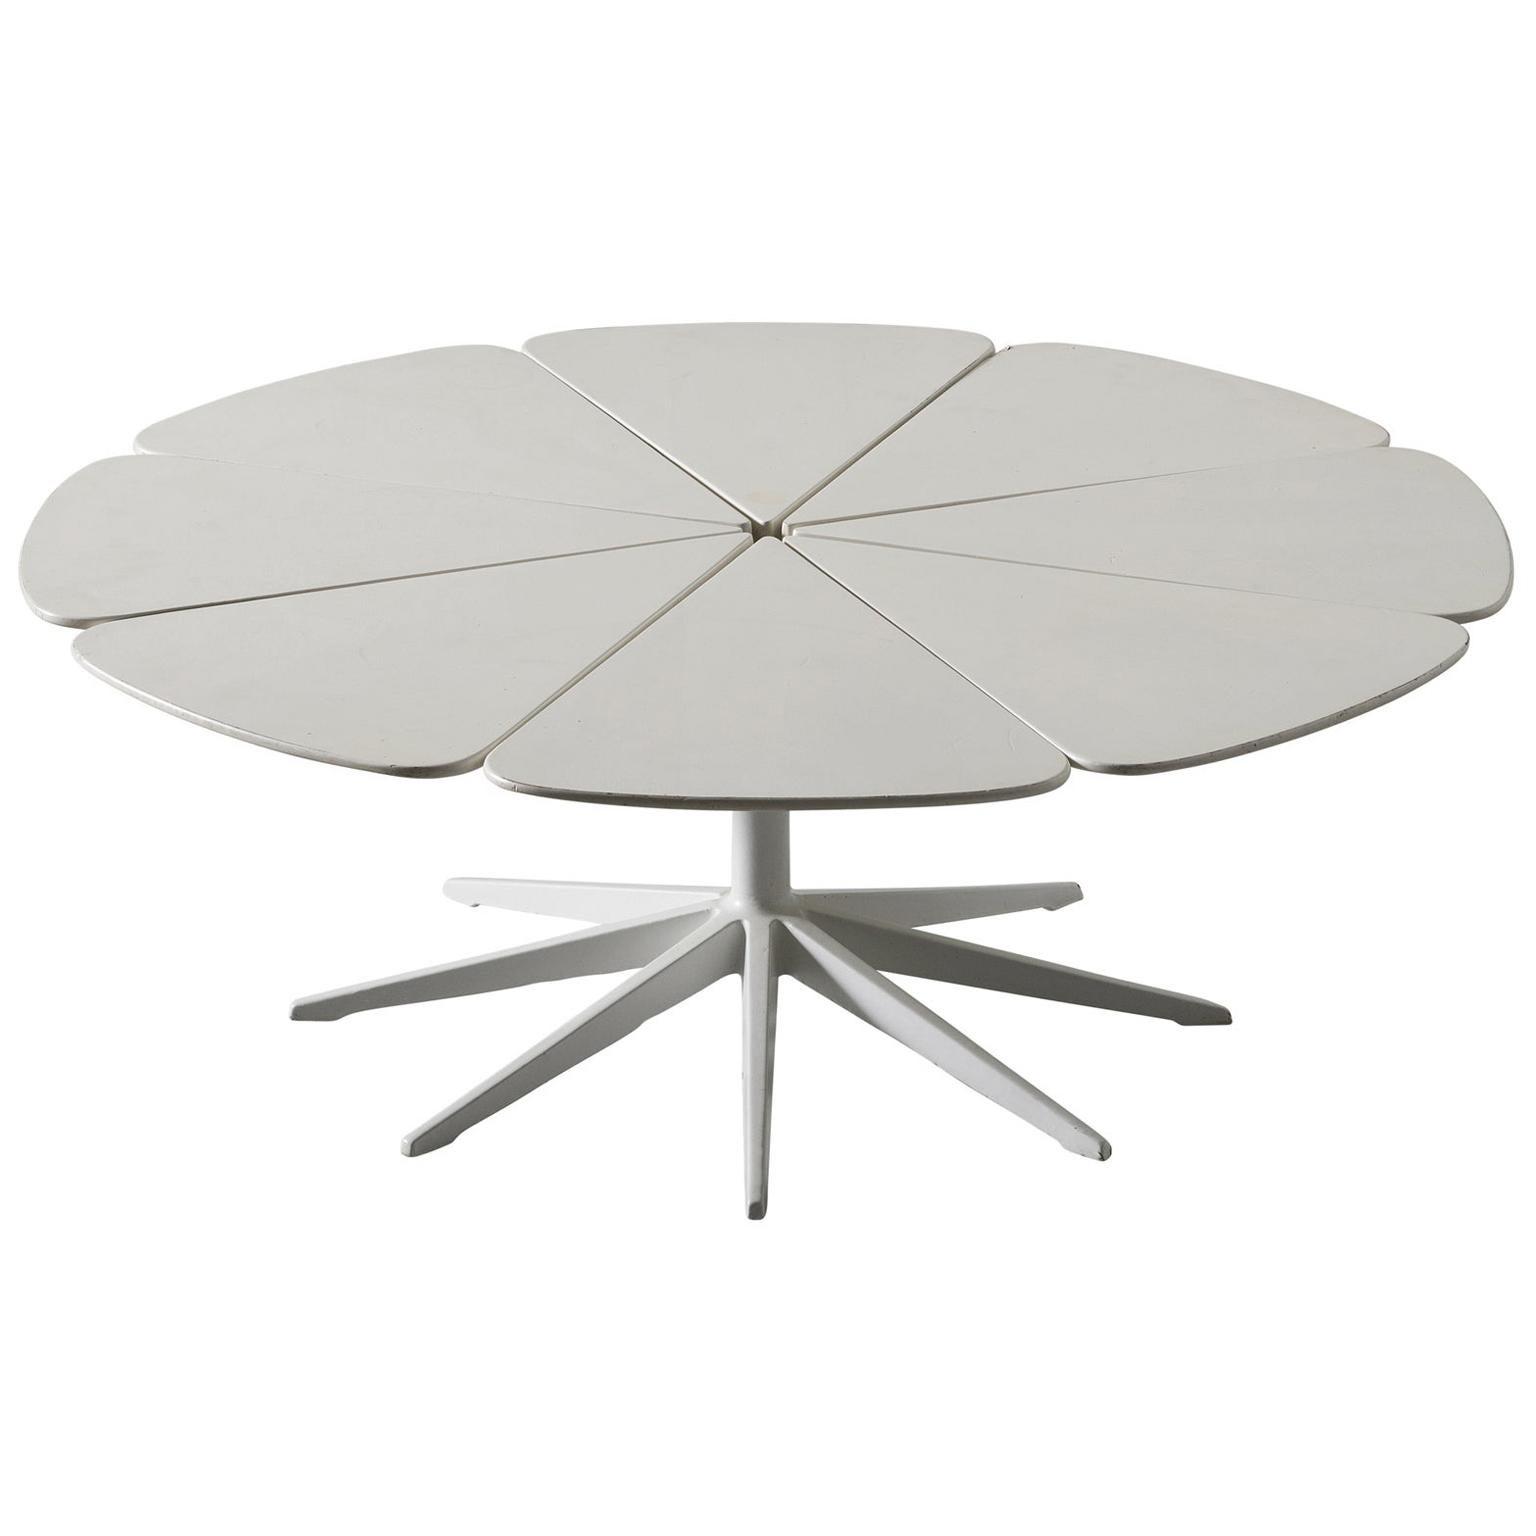 Richard Schultz for Knoll White Petal Side Table